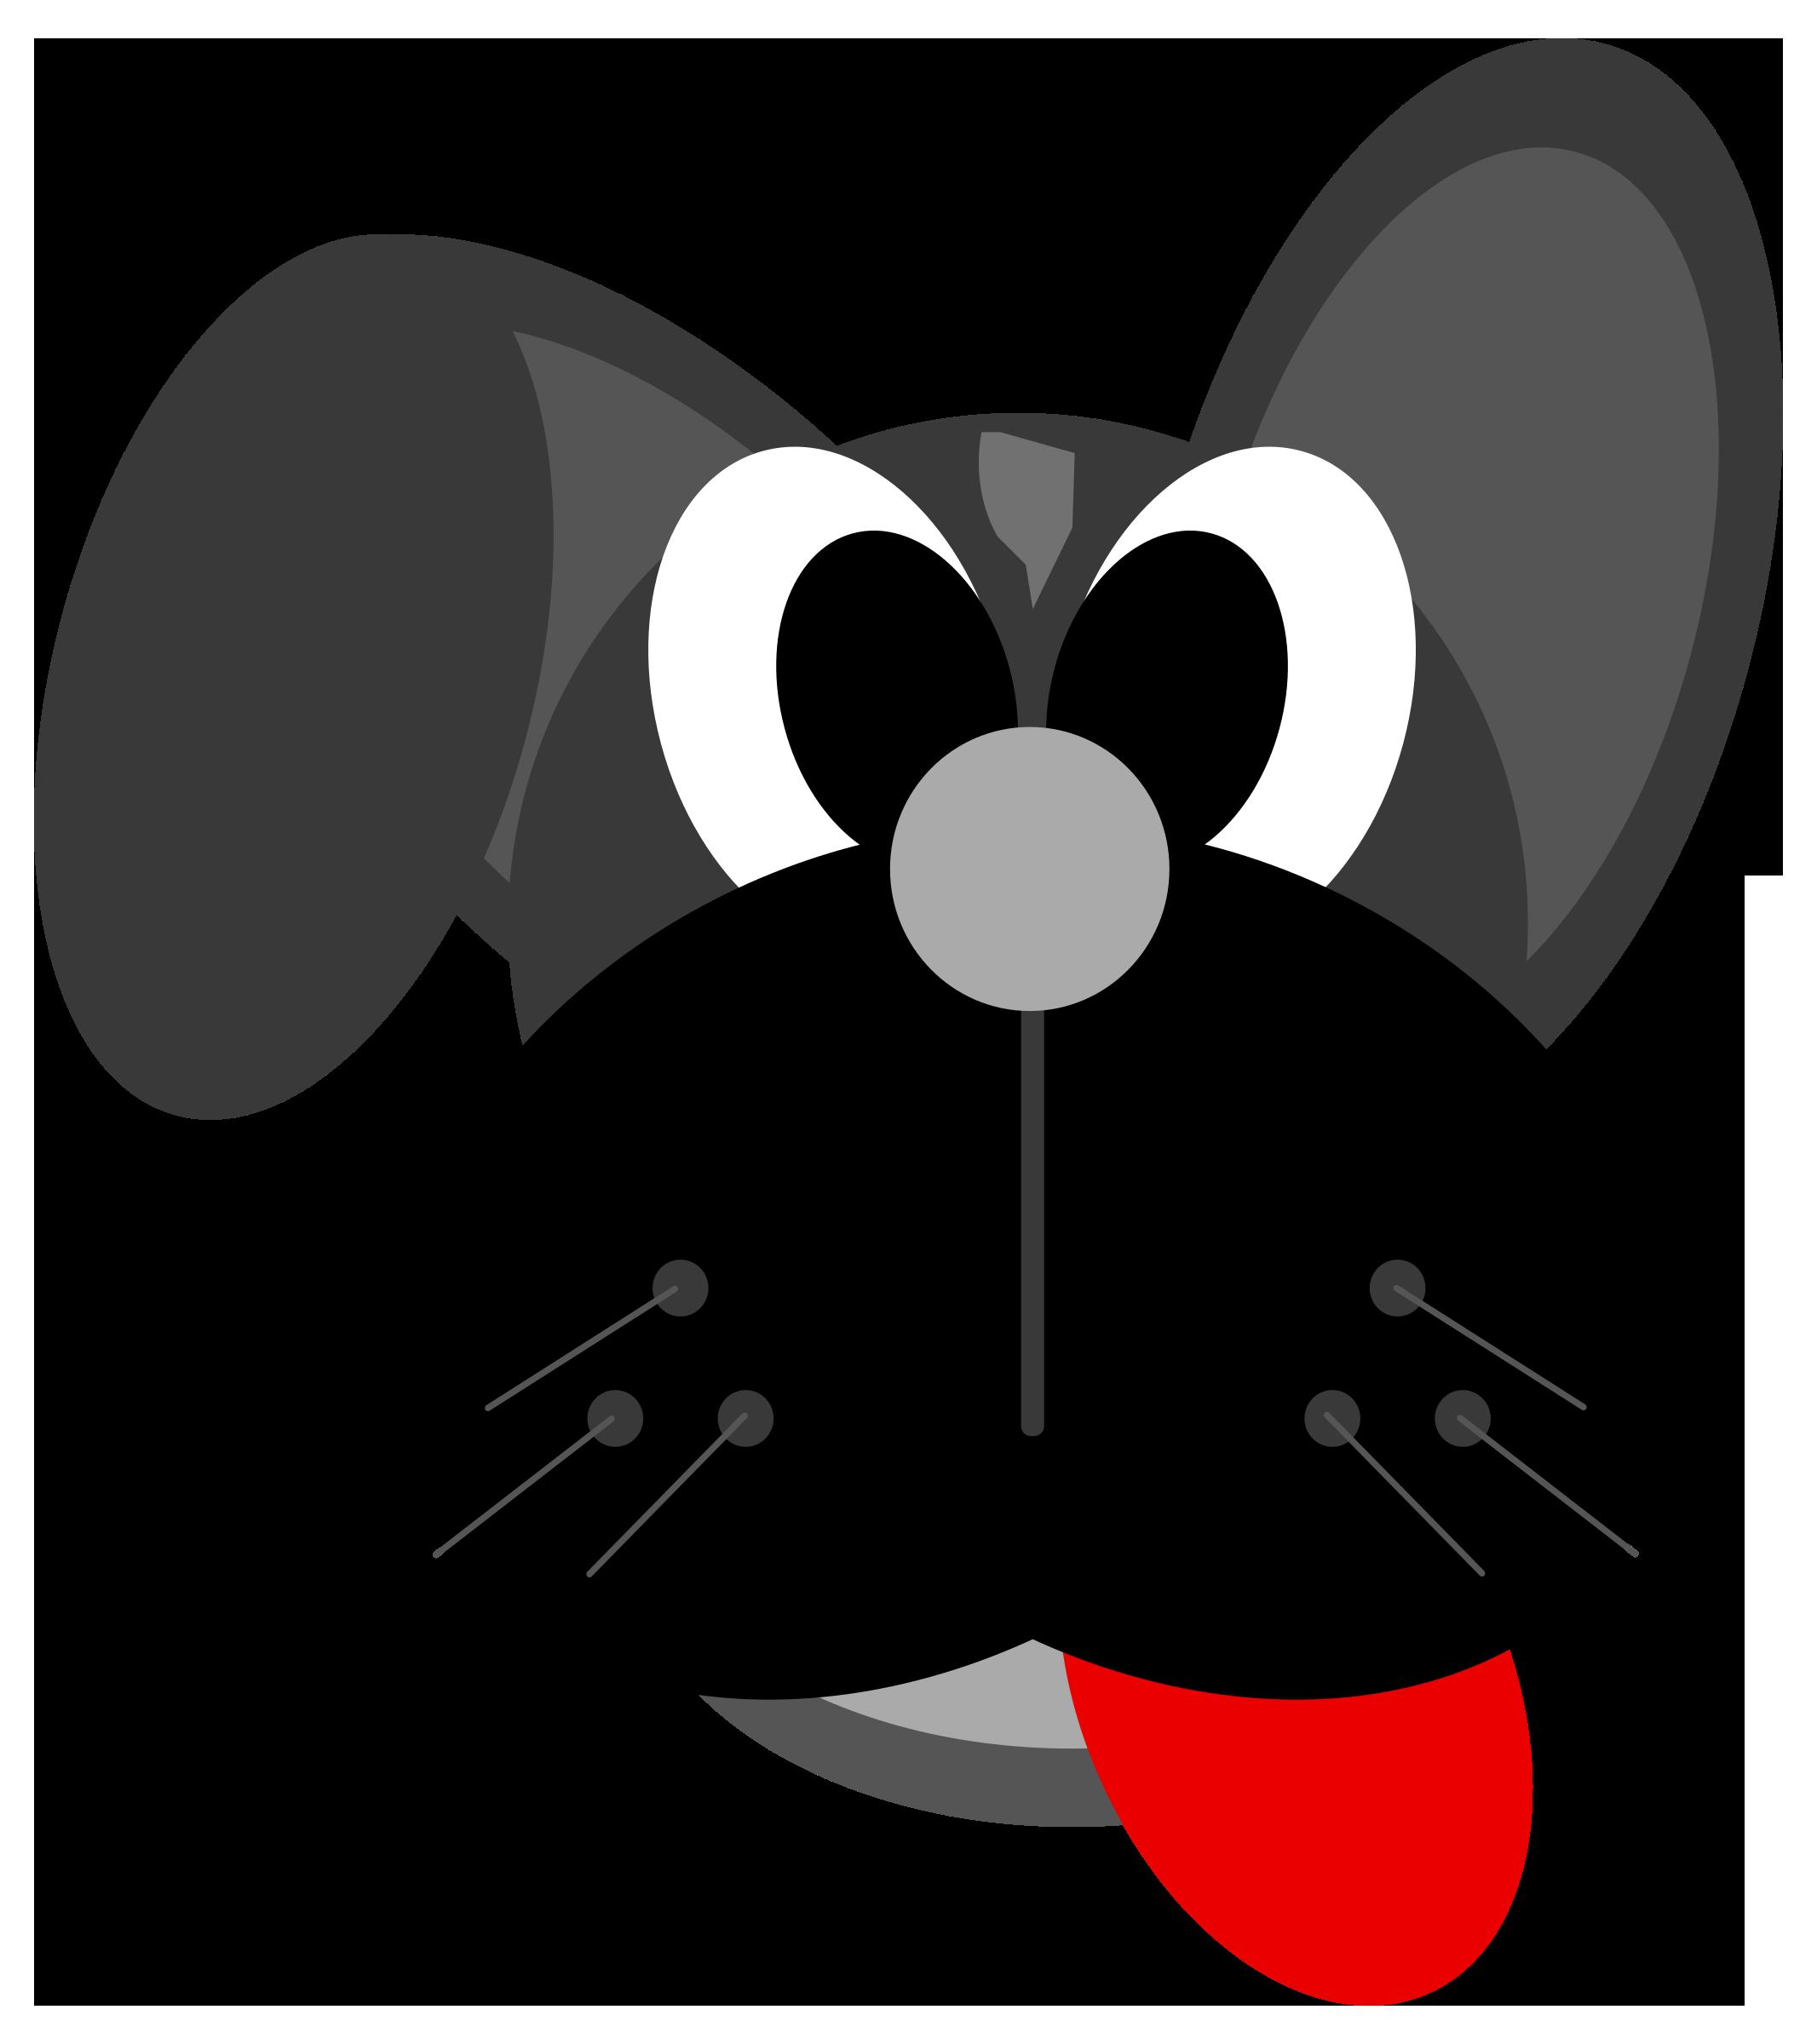 Dog Cartoon Vector Clipart image.